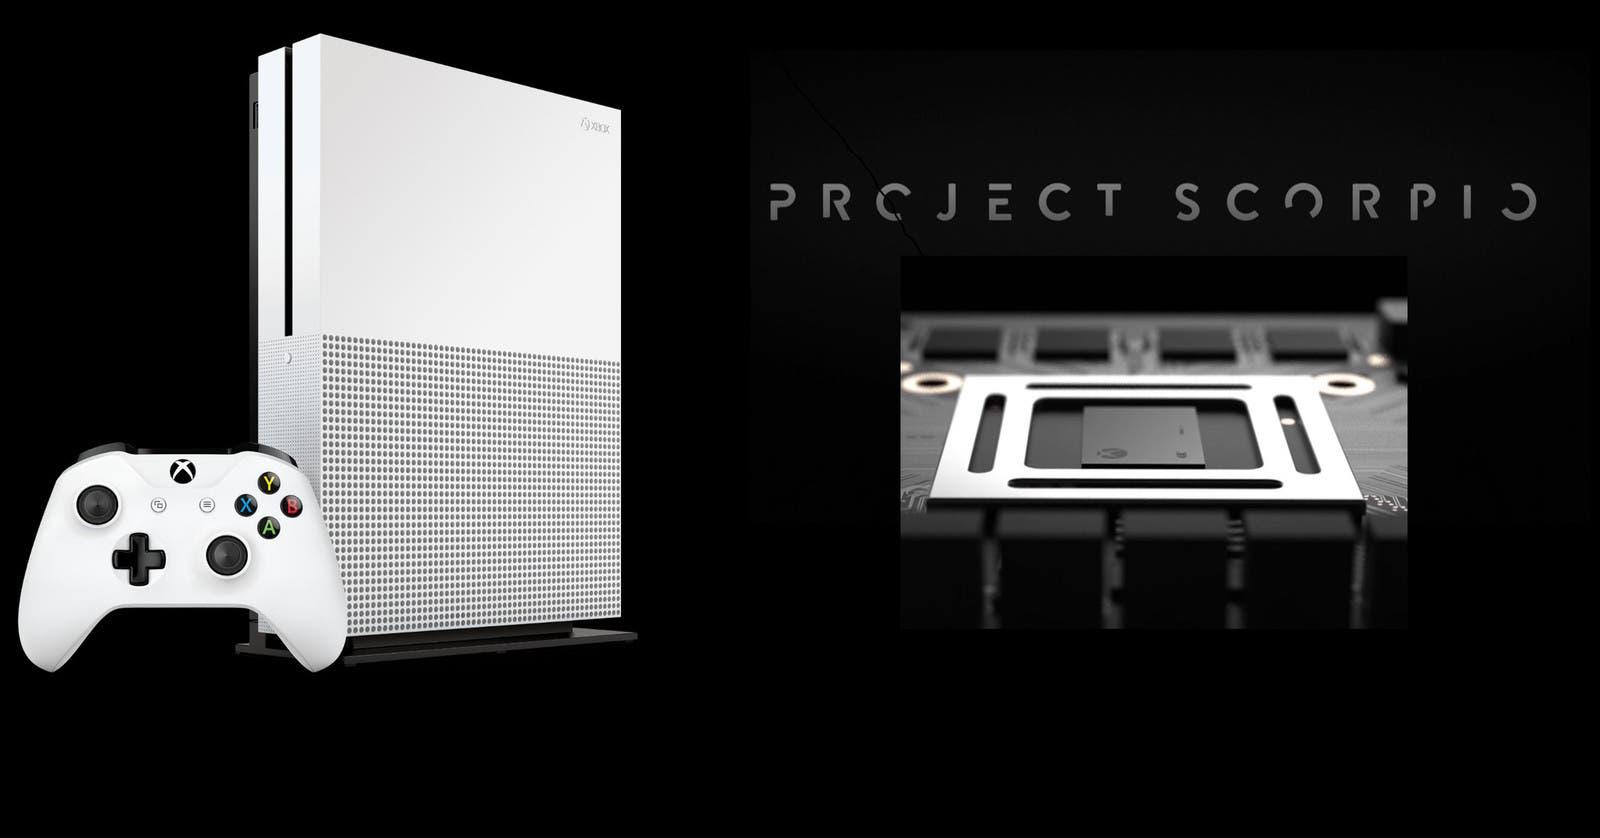 Xbox One S - Project Scorpio